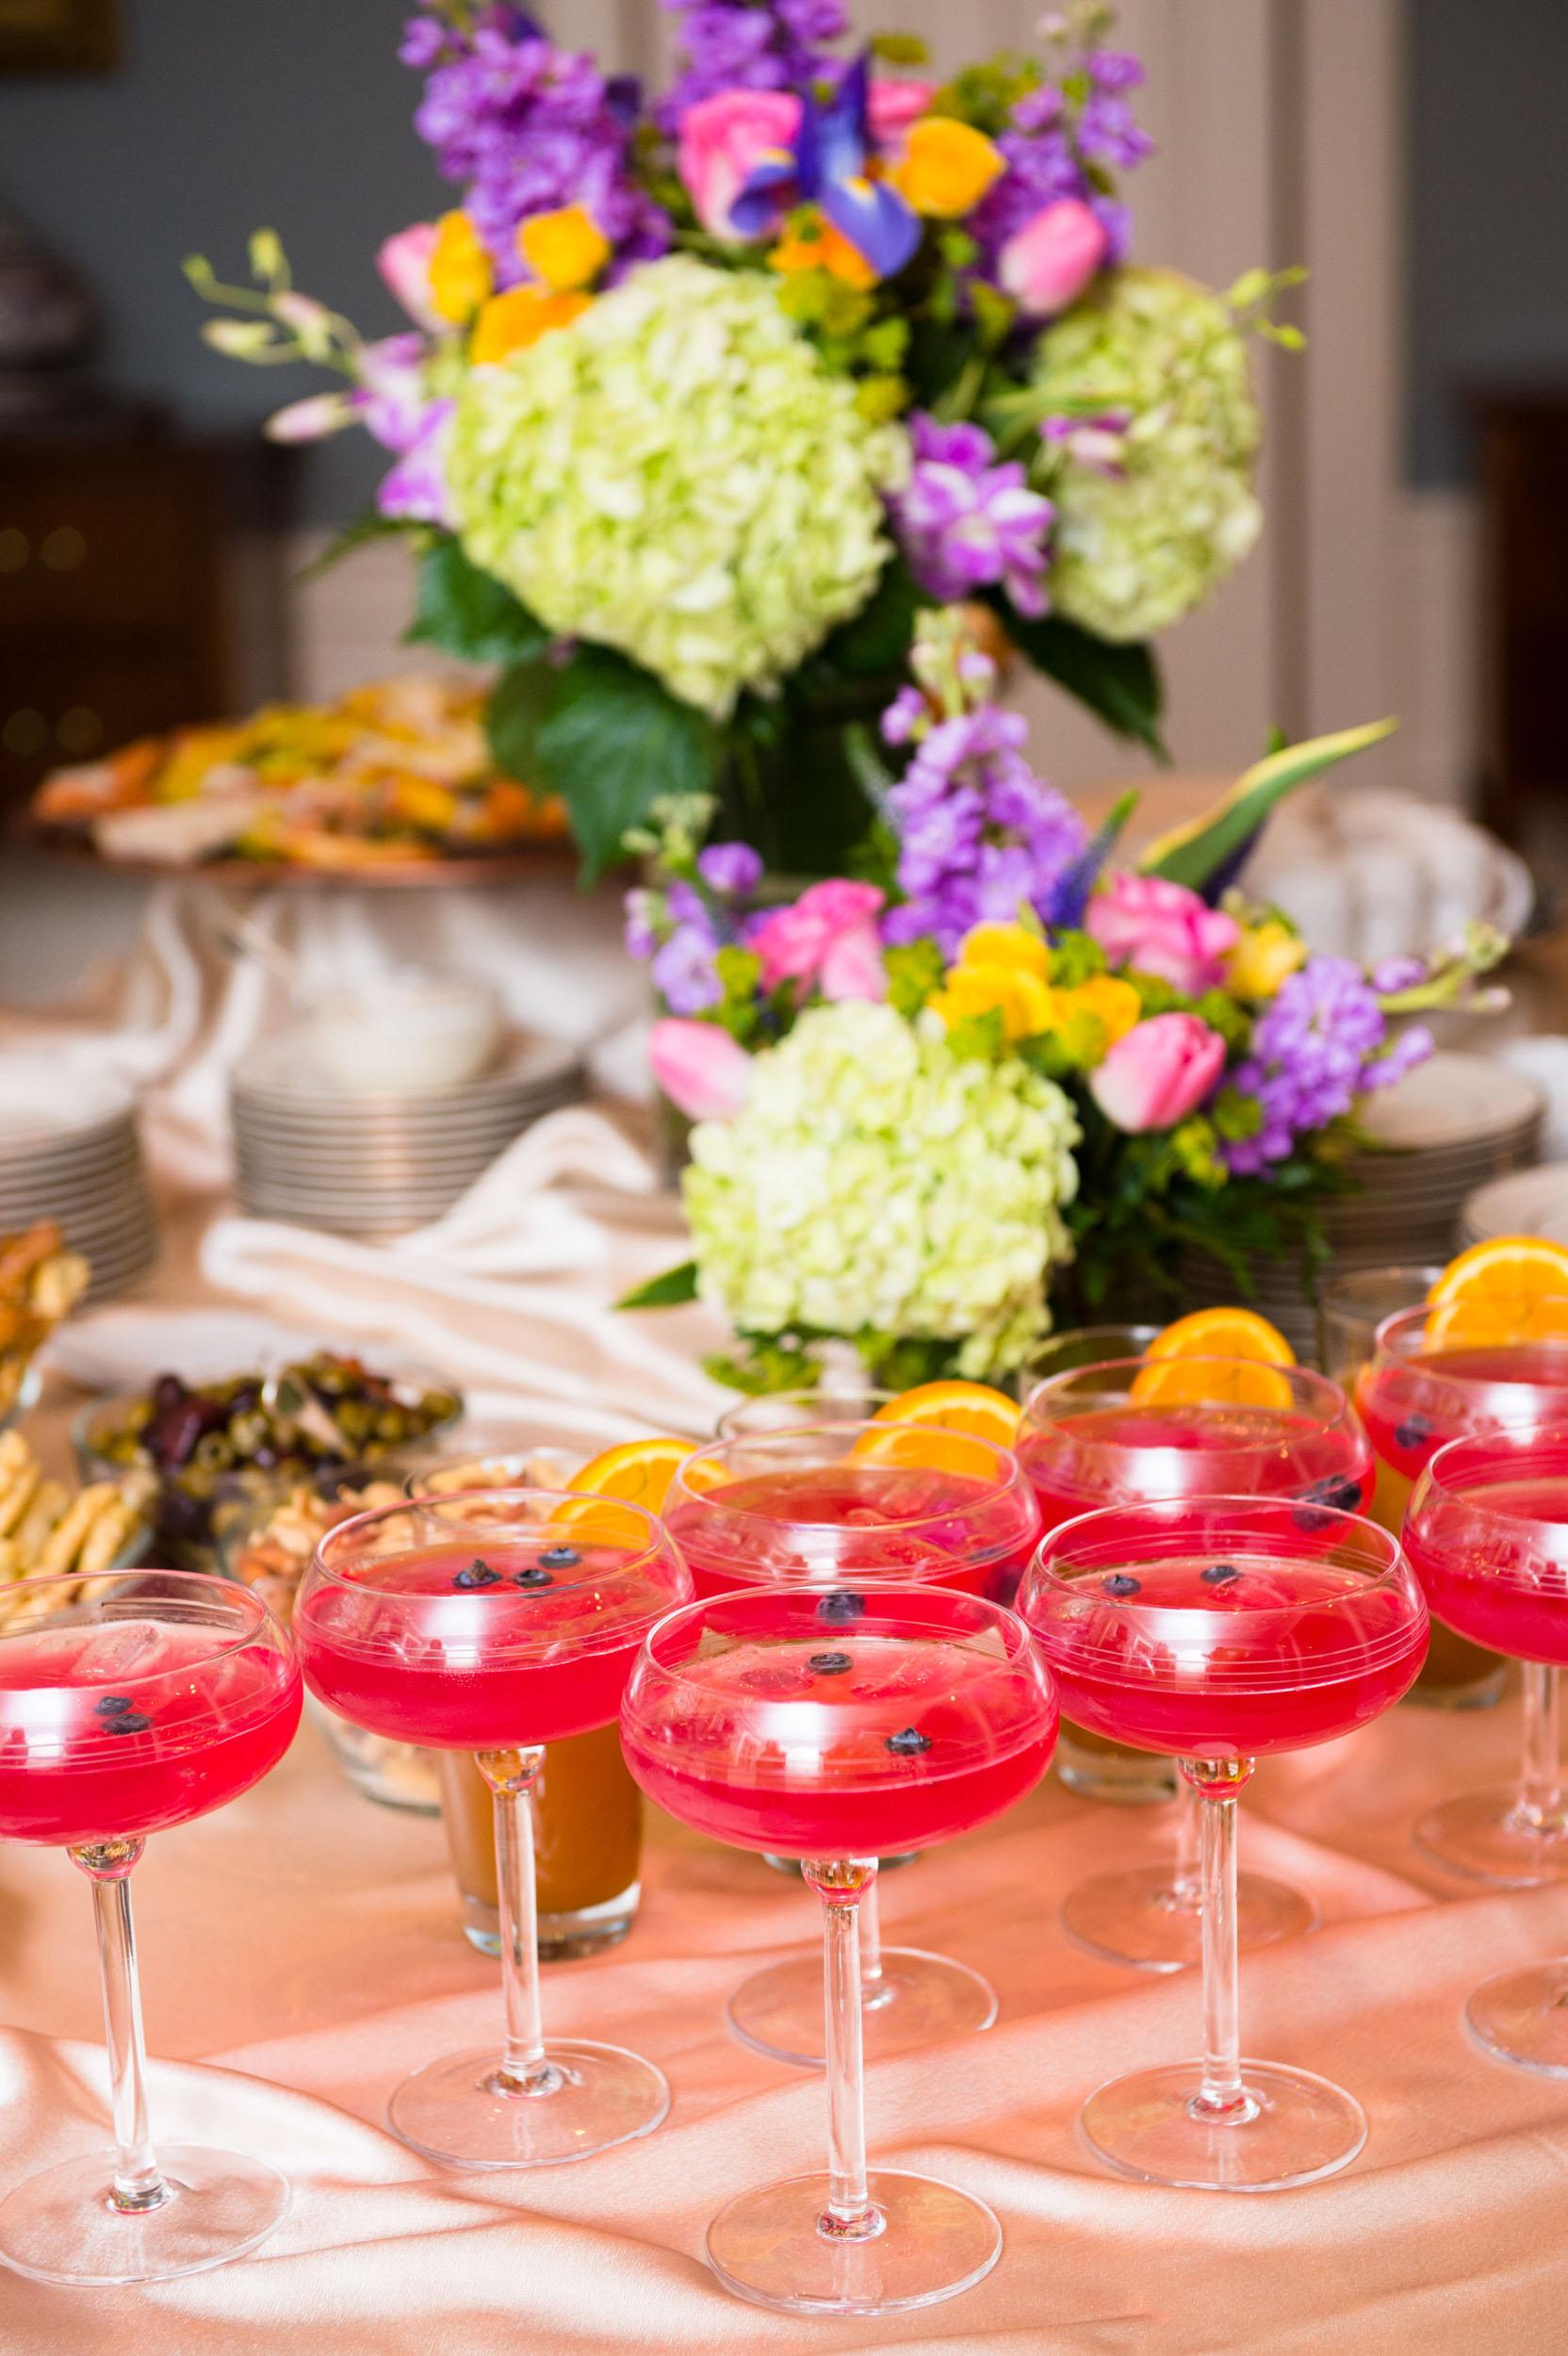 Maura Wayman Photography, Photography, Corporate Photography,Massachusetts, Boston, Metro West, events, Corporate events, Photographer, Functions, Parties, Fundraisers, Lahey, Lahey Health, Party, Drinks,